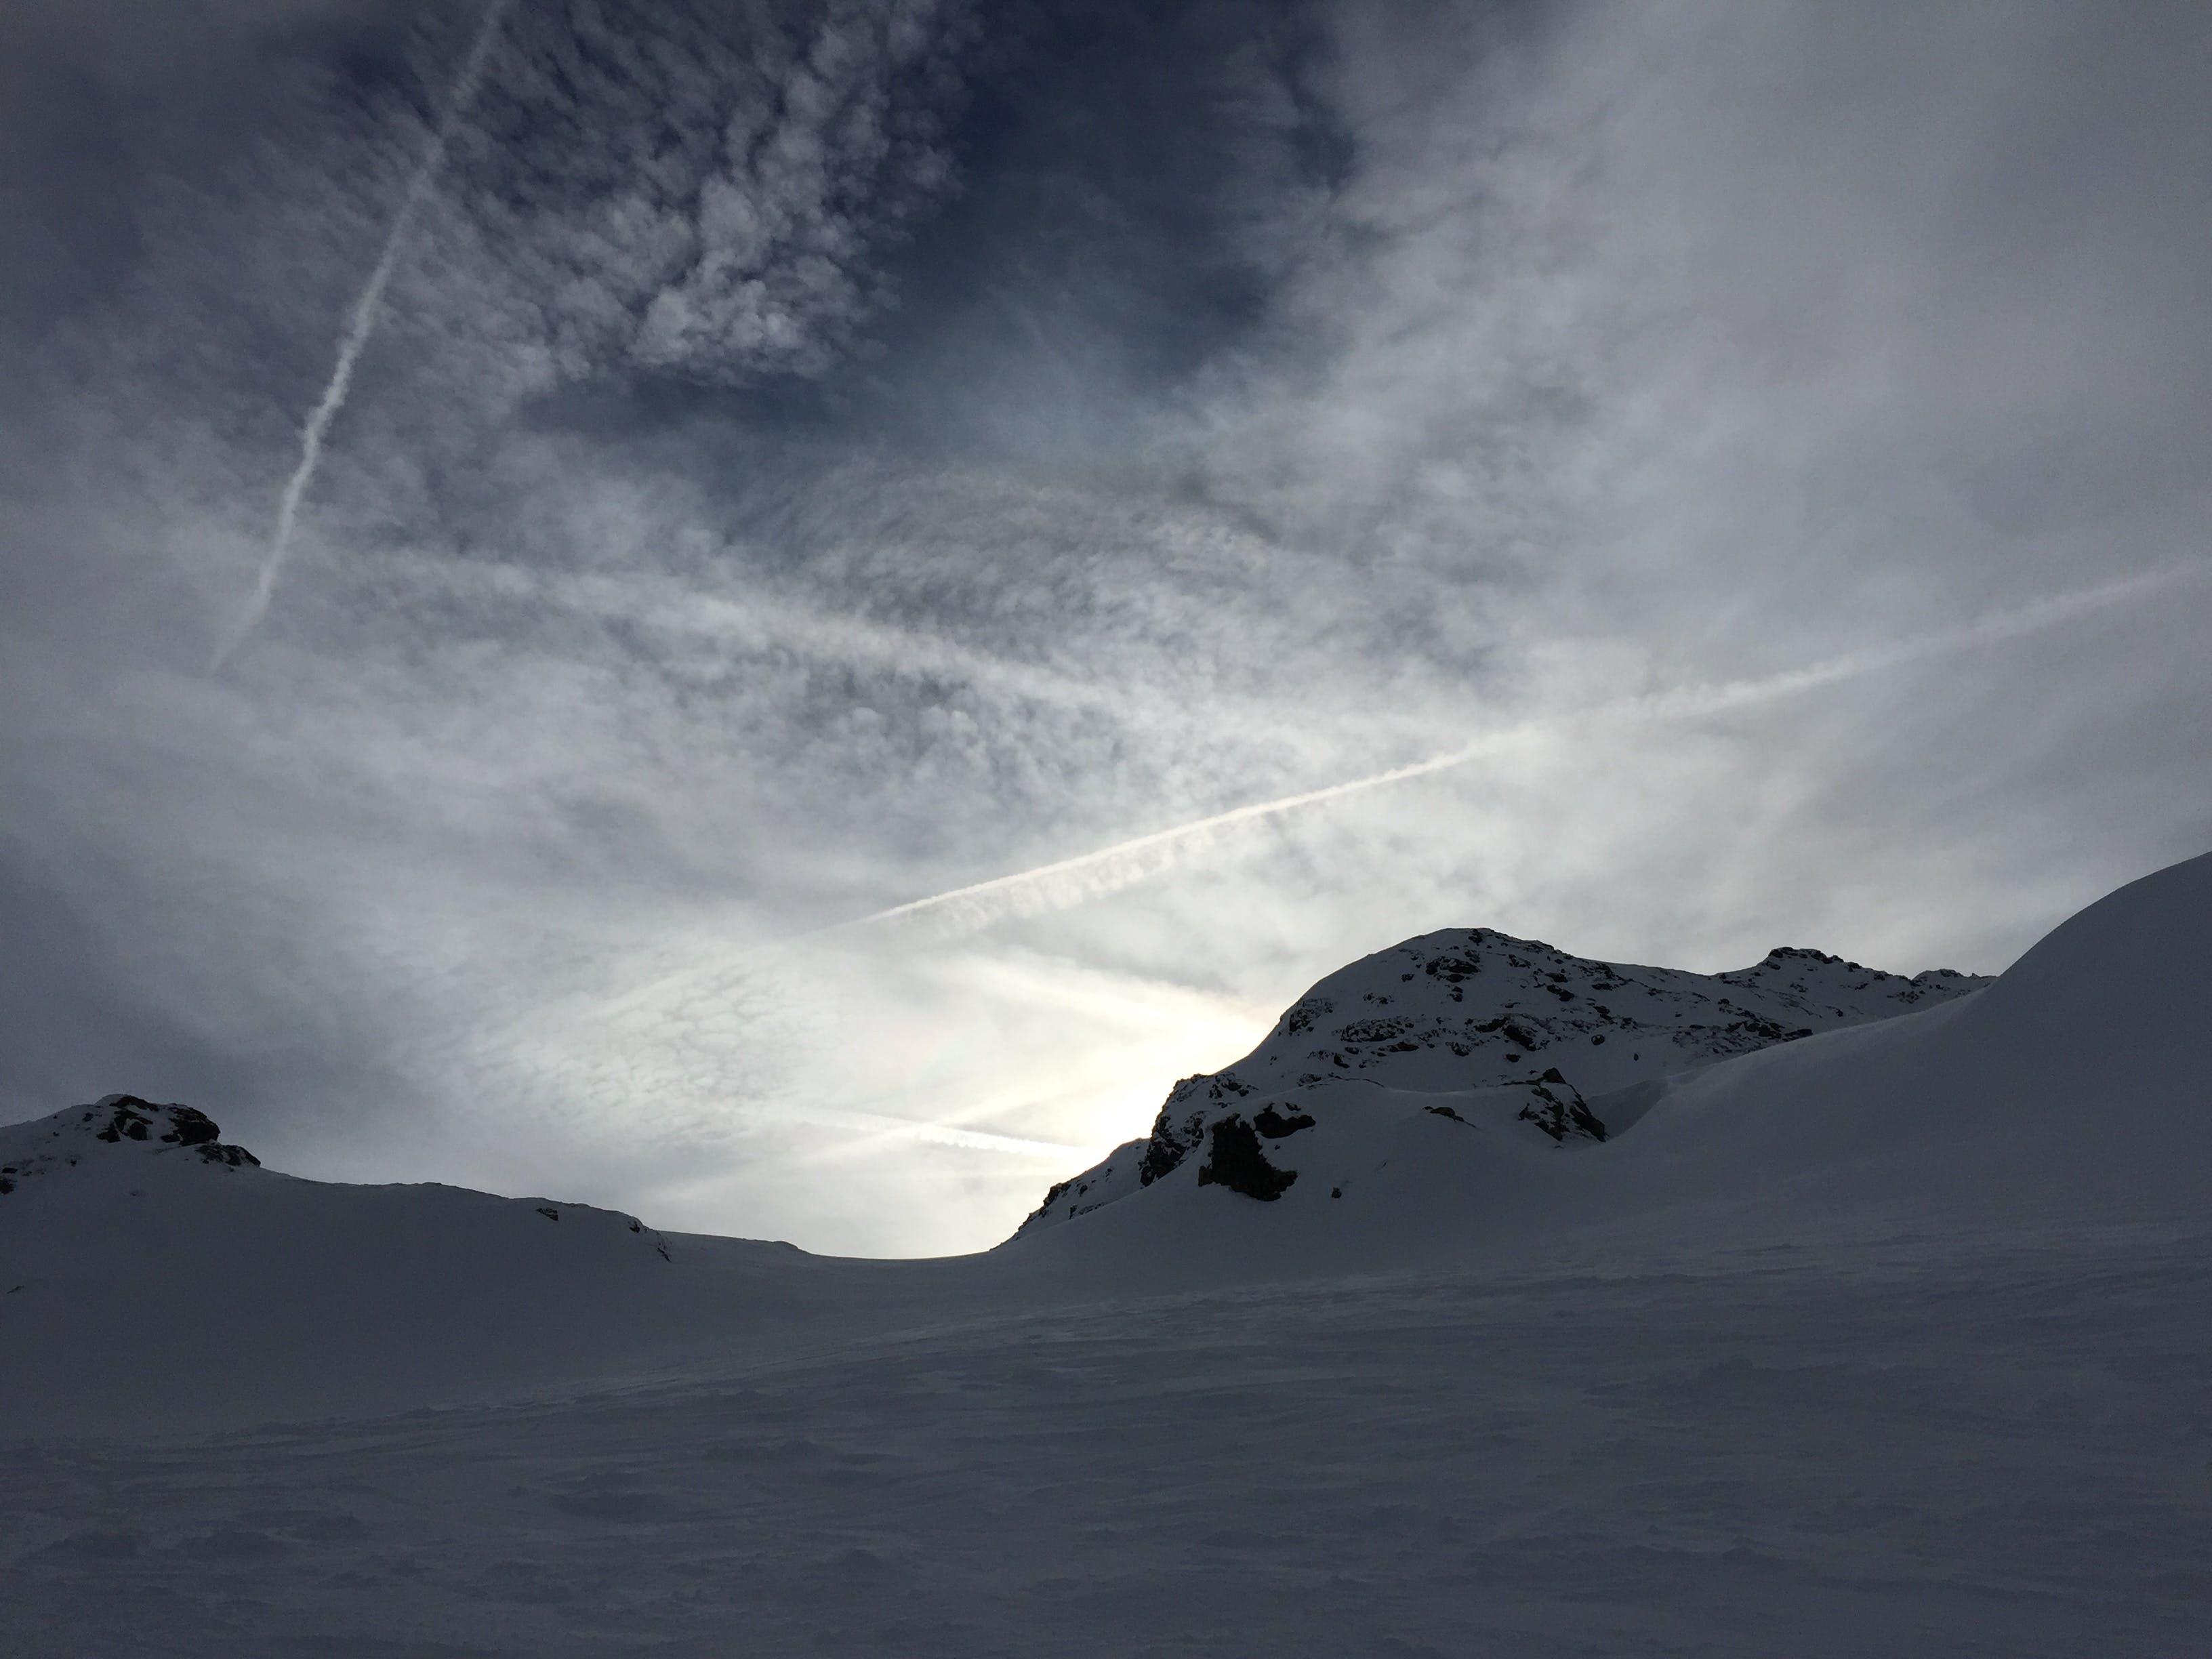 Free stock photo of cloud formation, evening sun, mountain peak, winter landscape